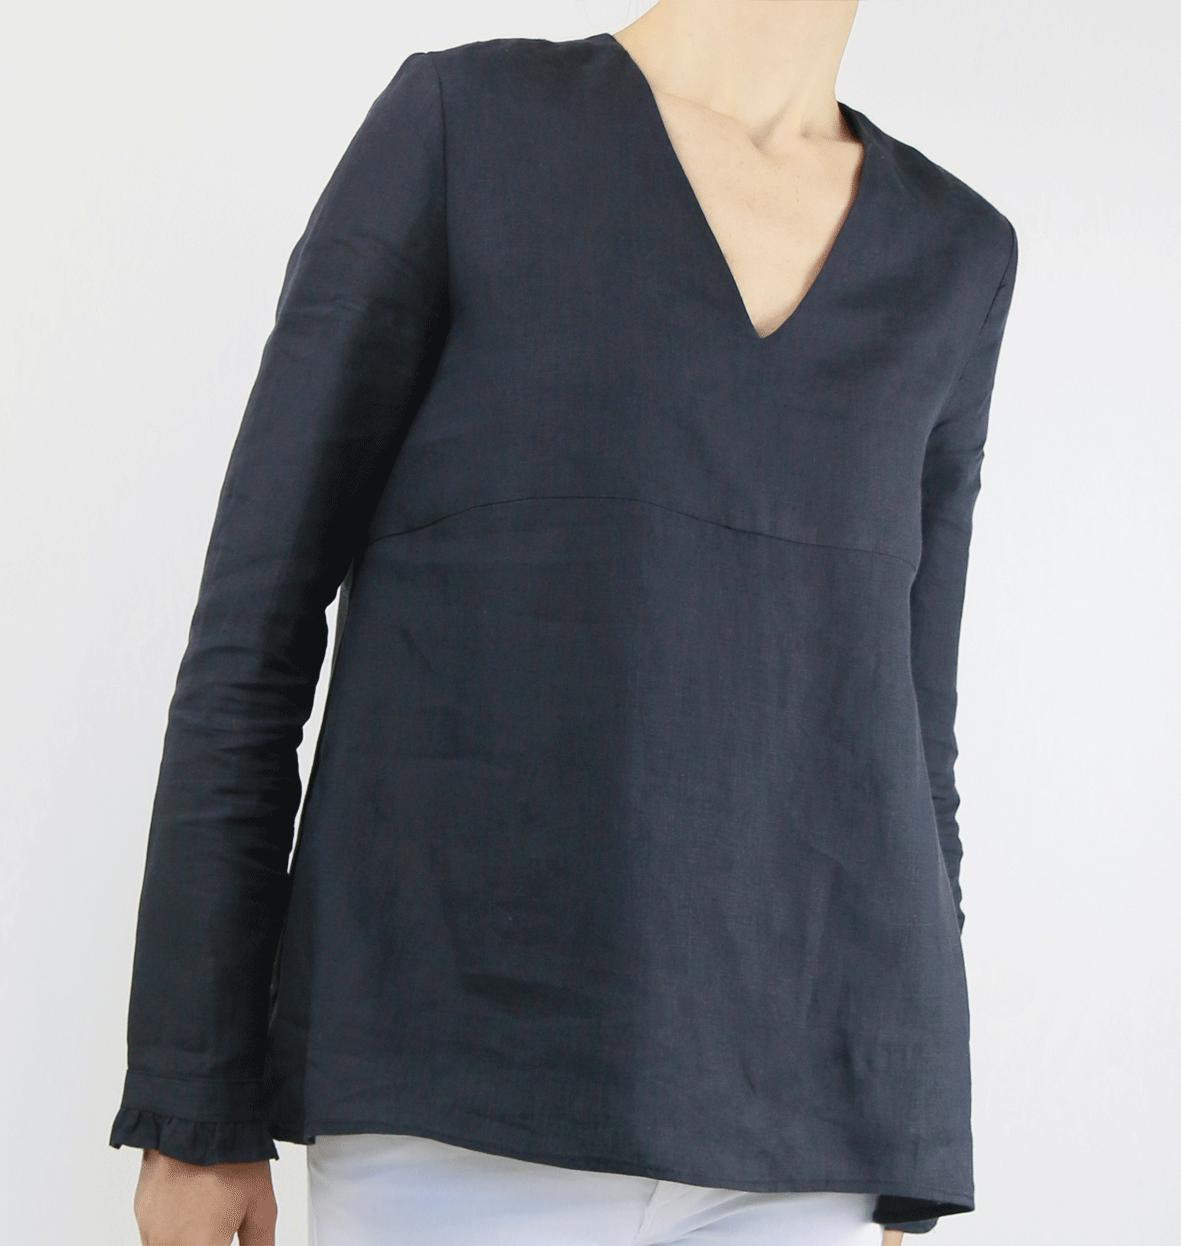 17-blousezephir-zephirpattern-atelierscammit